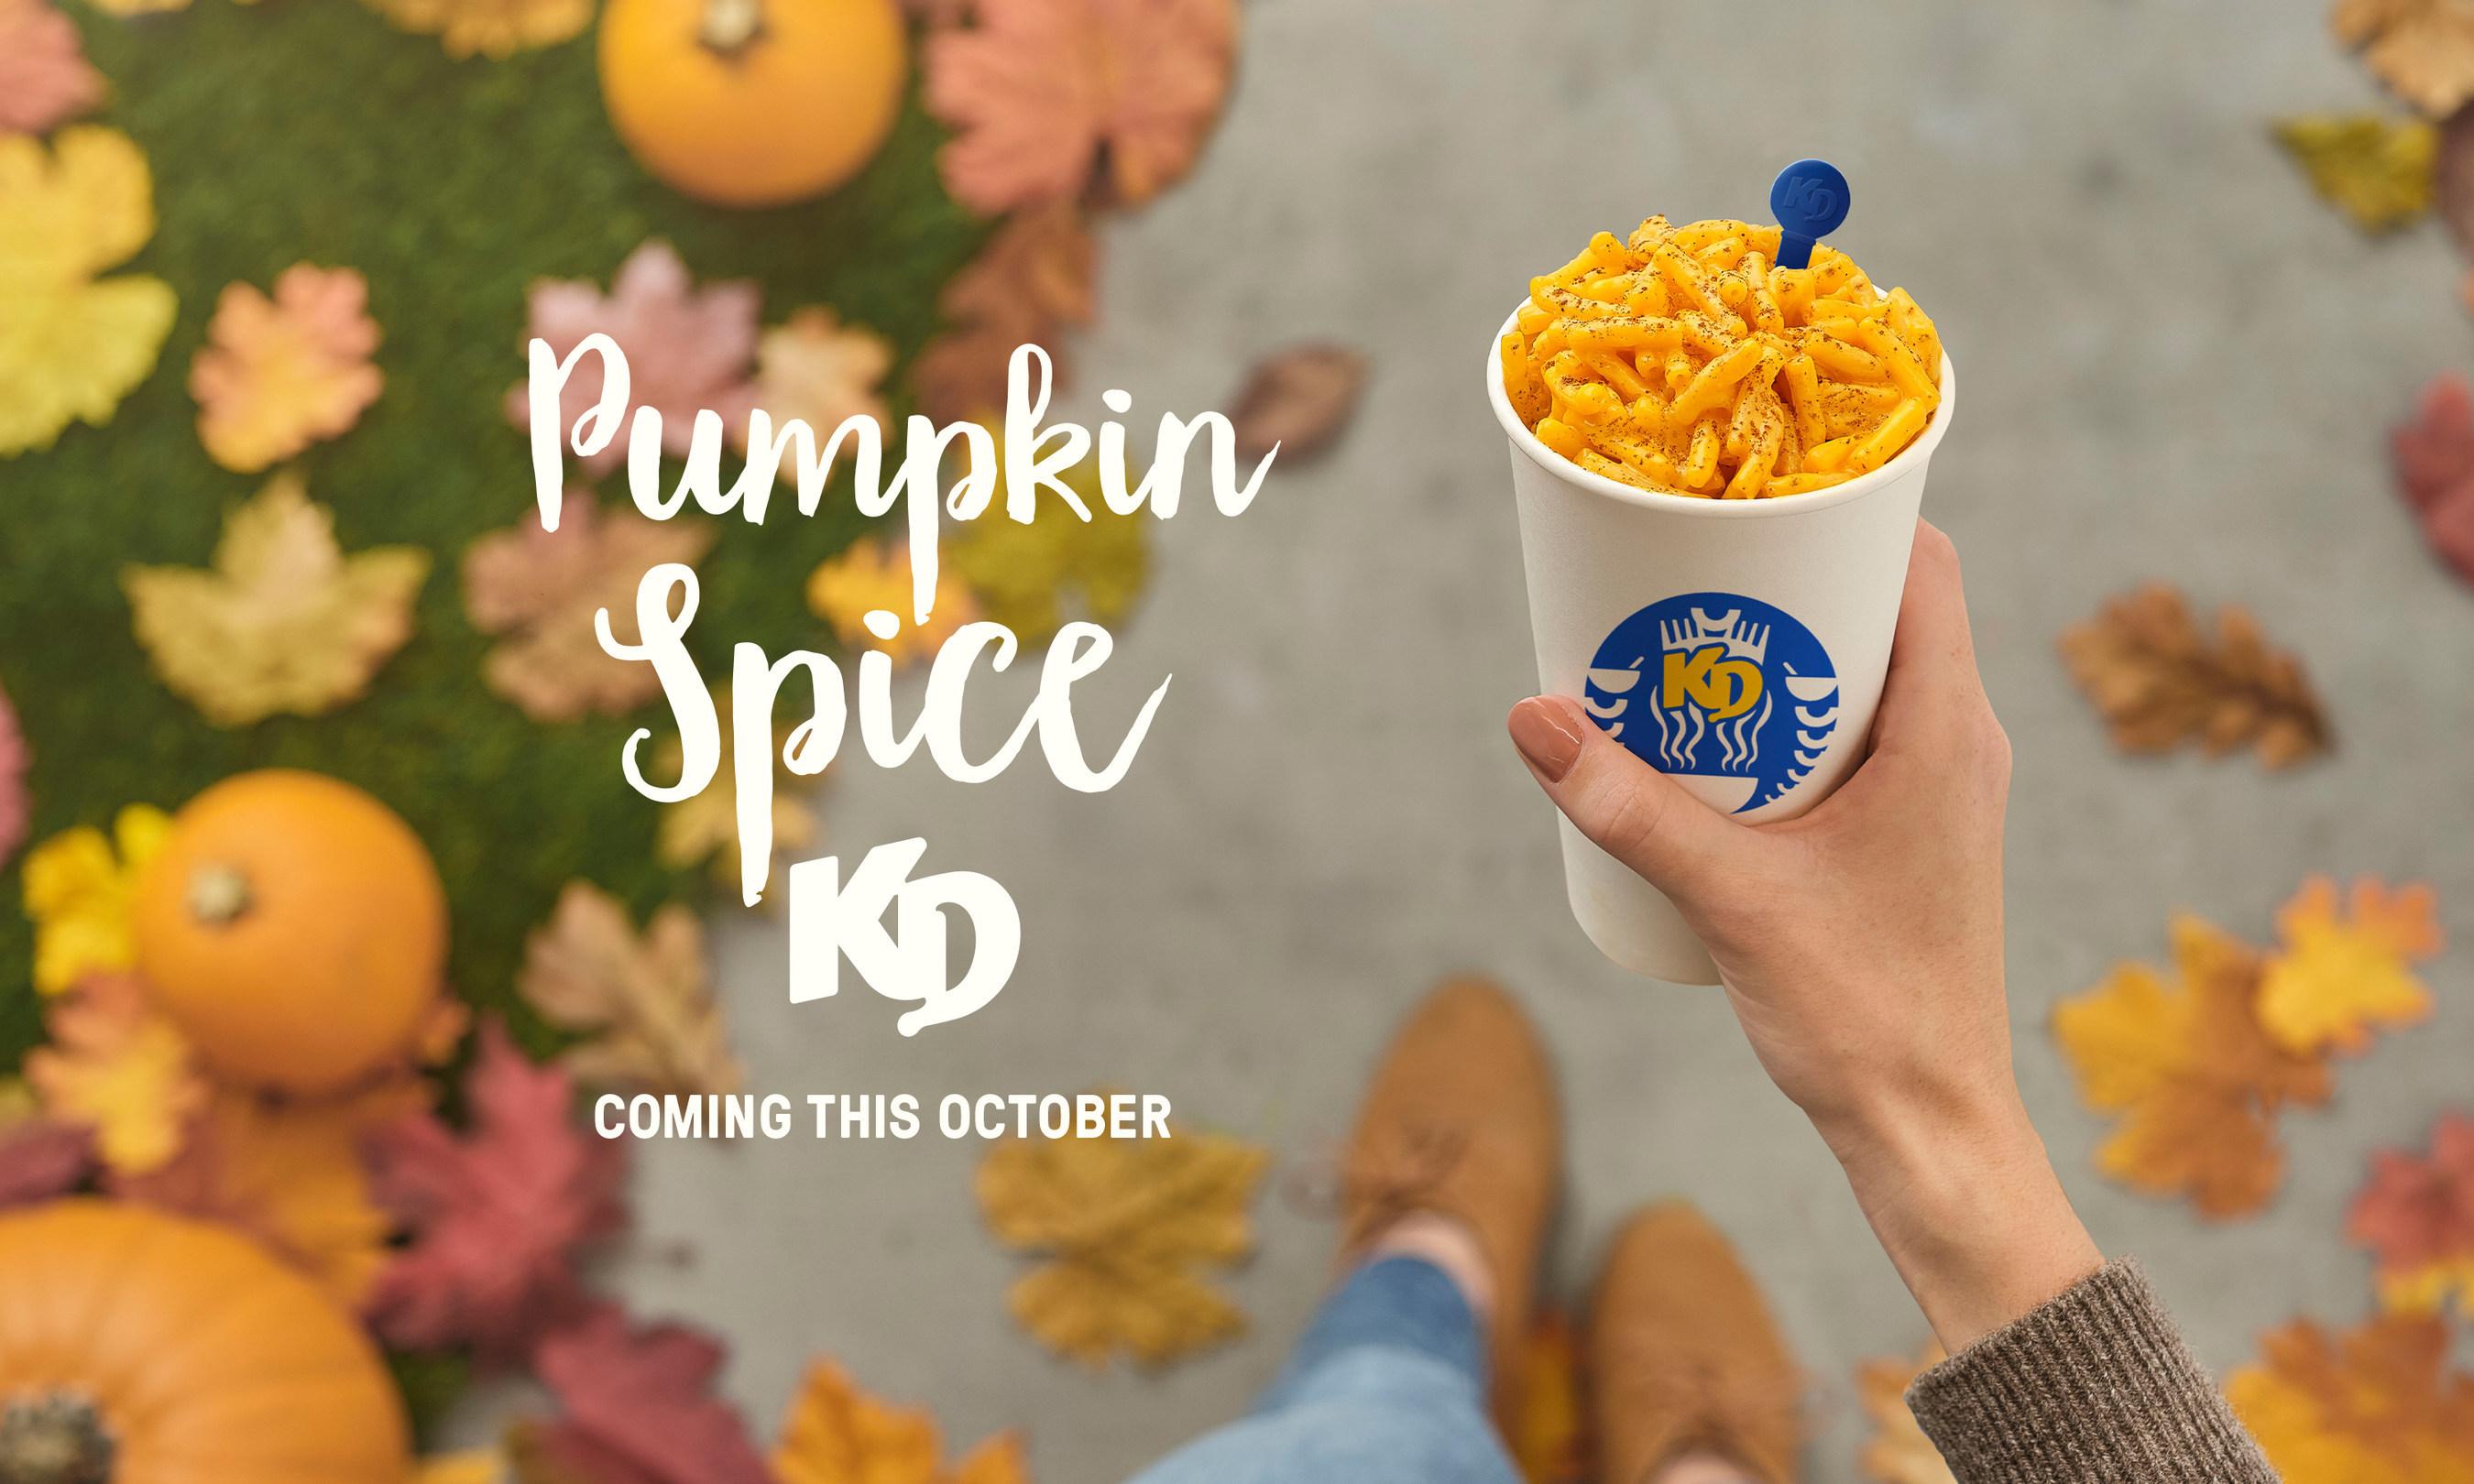 Kraft Dinner launches new #PumpkinSpiceKD this October.